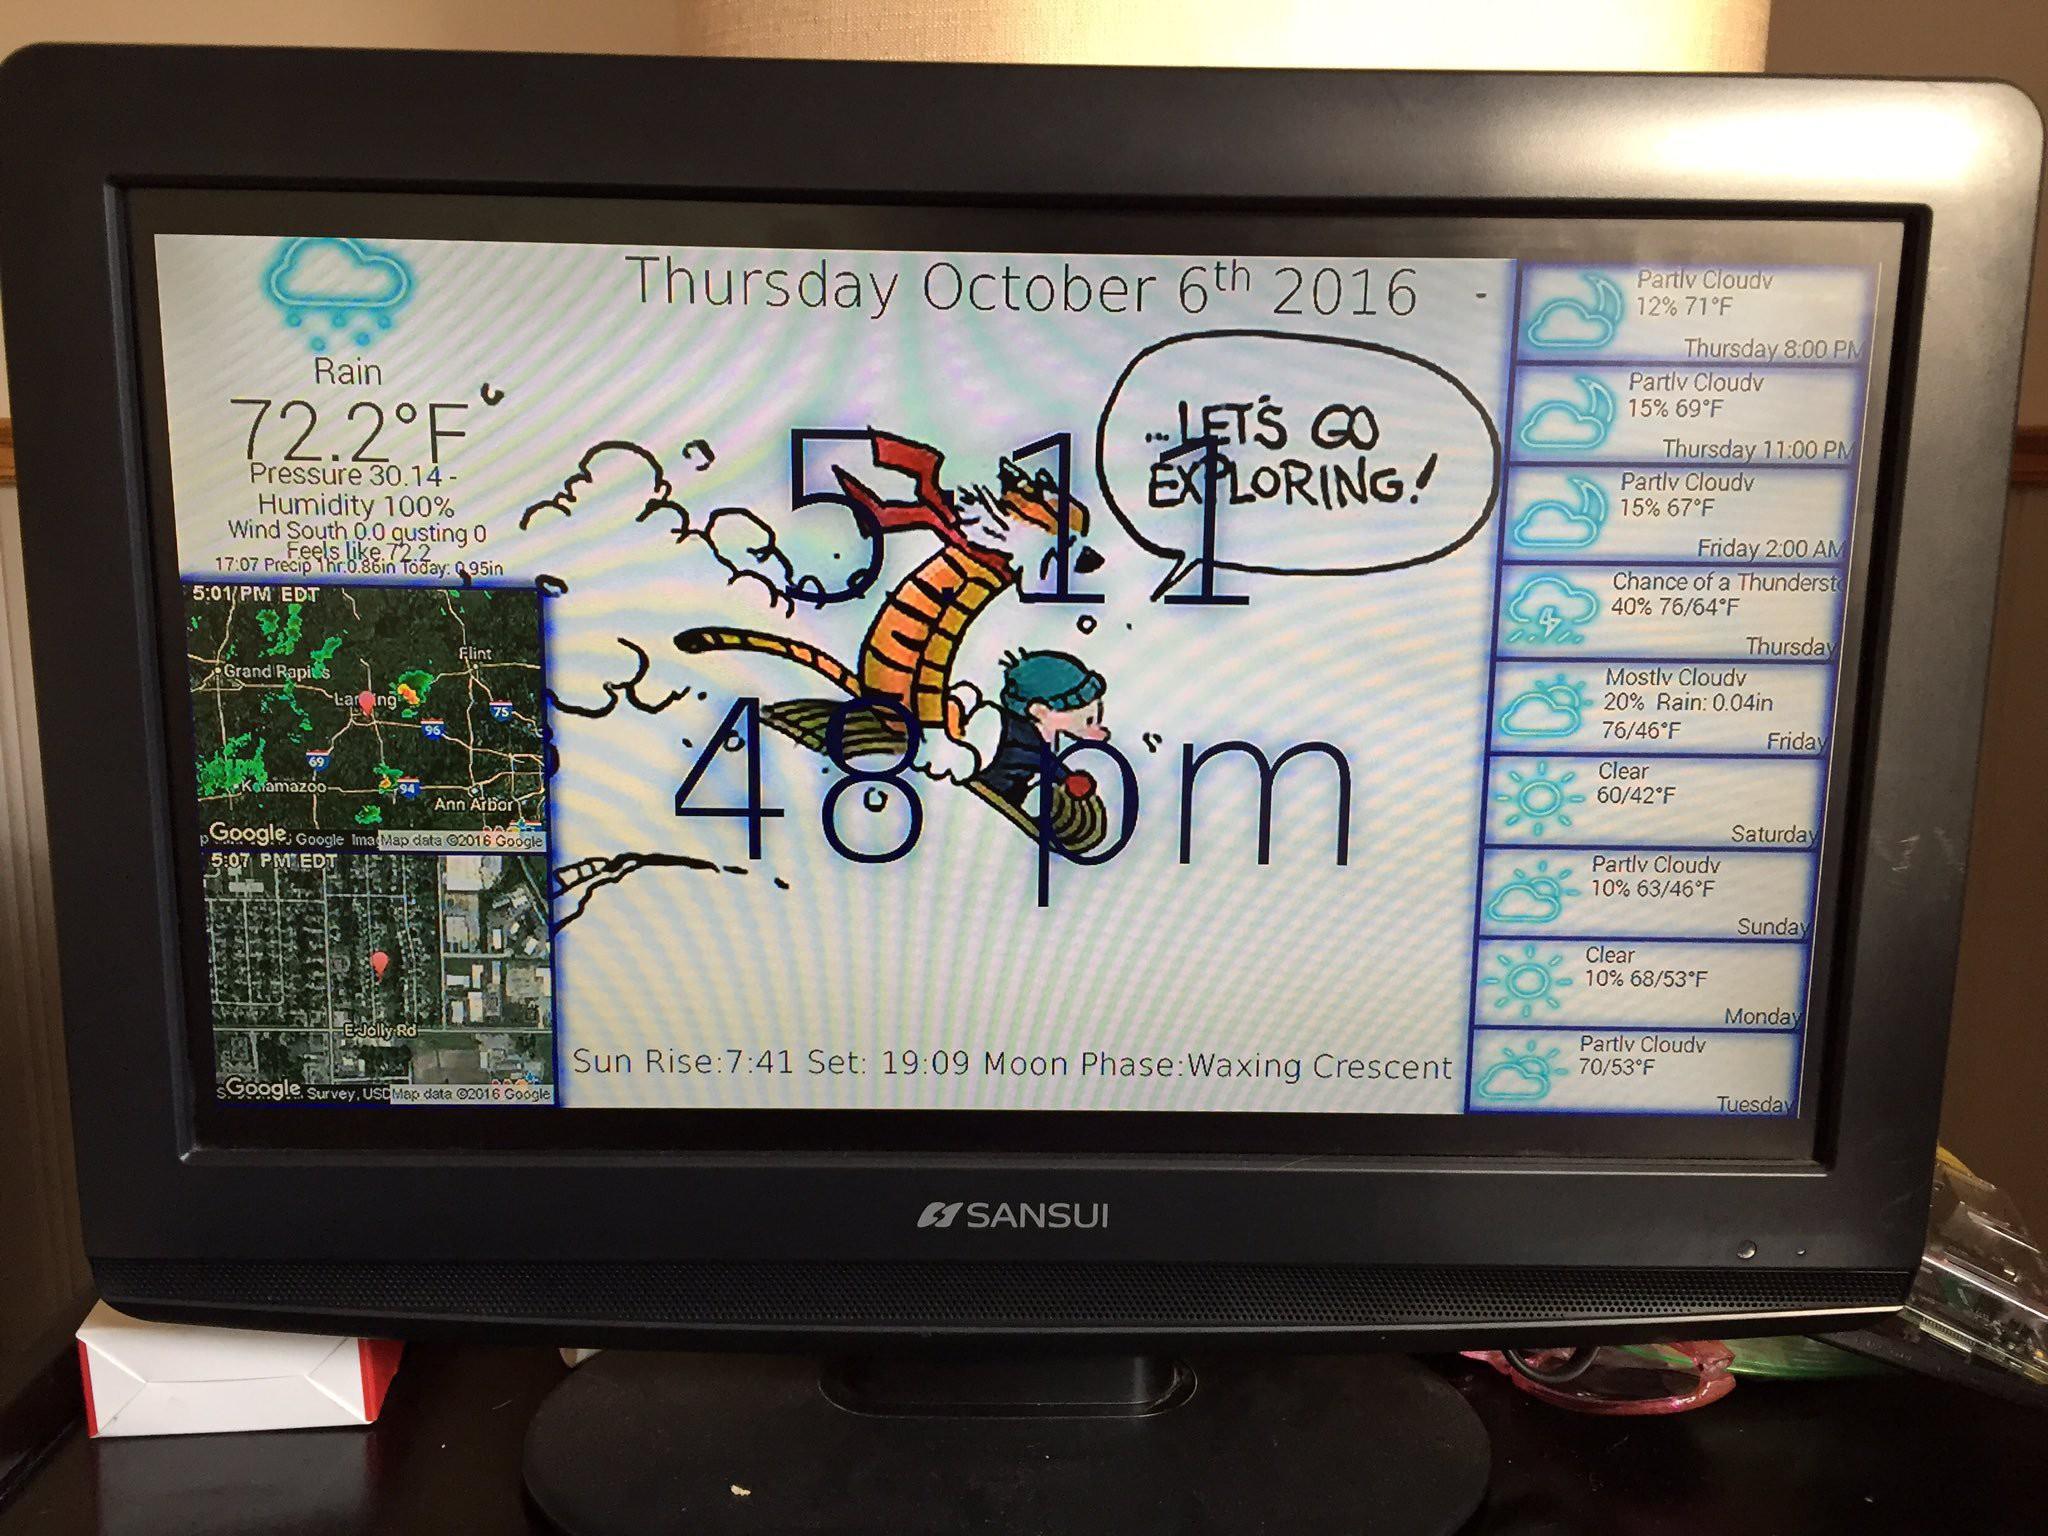 PiClock - A Raspberry Pi Clock & Weather Display | Hackaday io